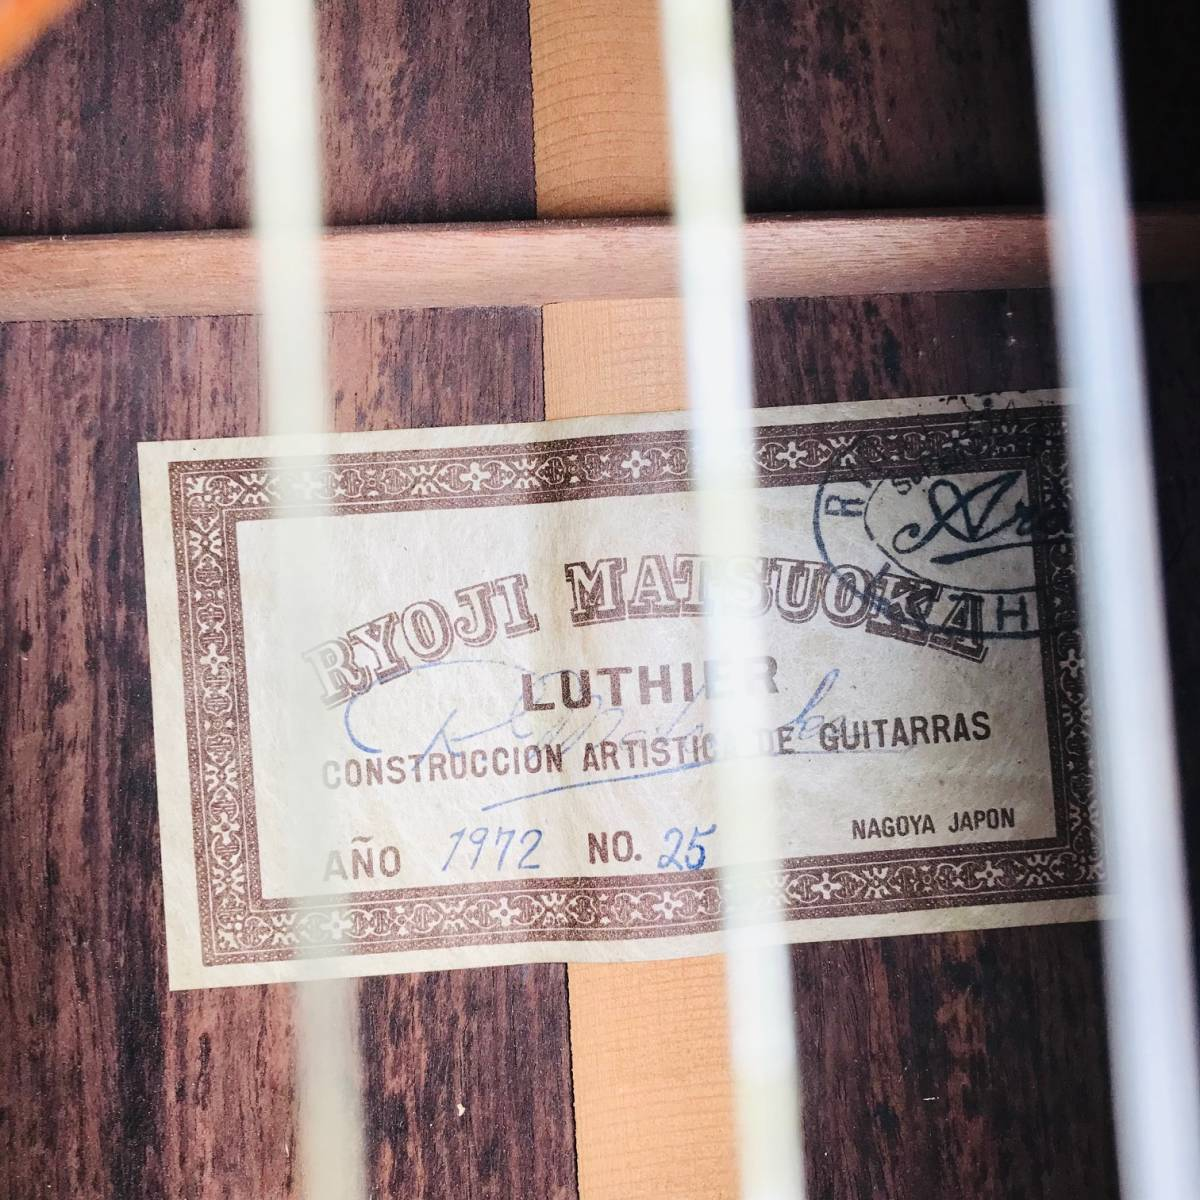 RYOJI MATSUOKA 松岡良治 ギター LUTHIER NO.25 1972年 NAGOYA JAPON クラシックギター ハードケース付【現状品】_画像2